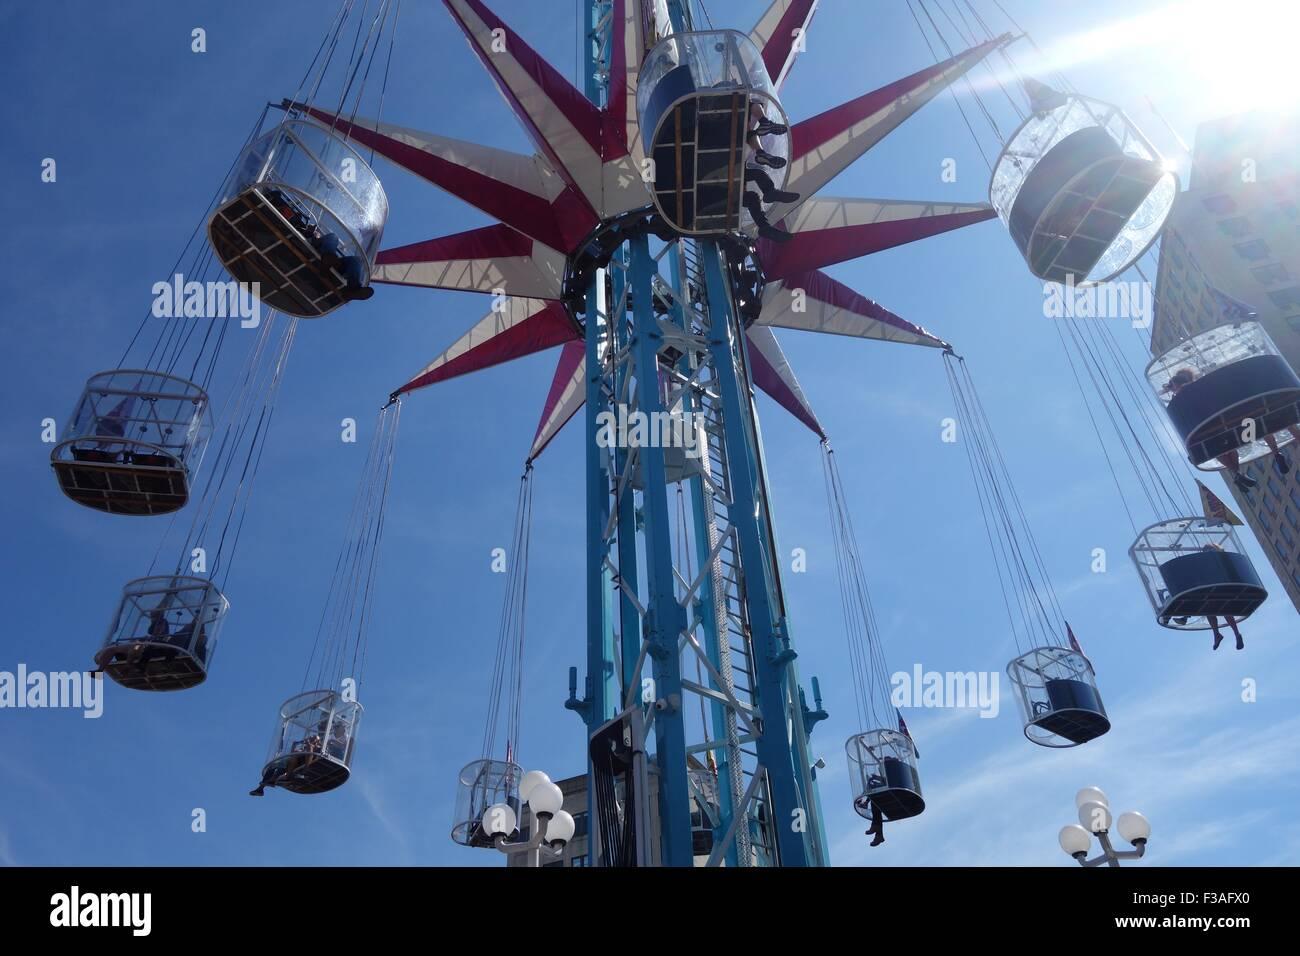 Starflyer (Skyflyer) , London Wonderground, Jubilee Gardens, Waterloo, London, UK Stock Photo